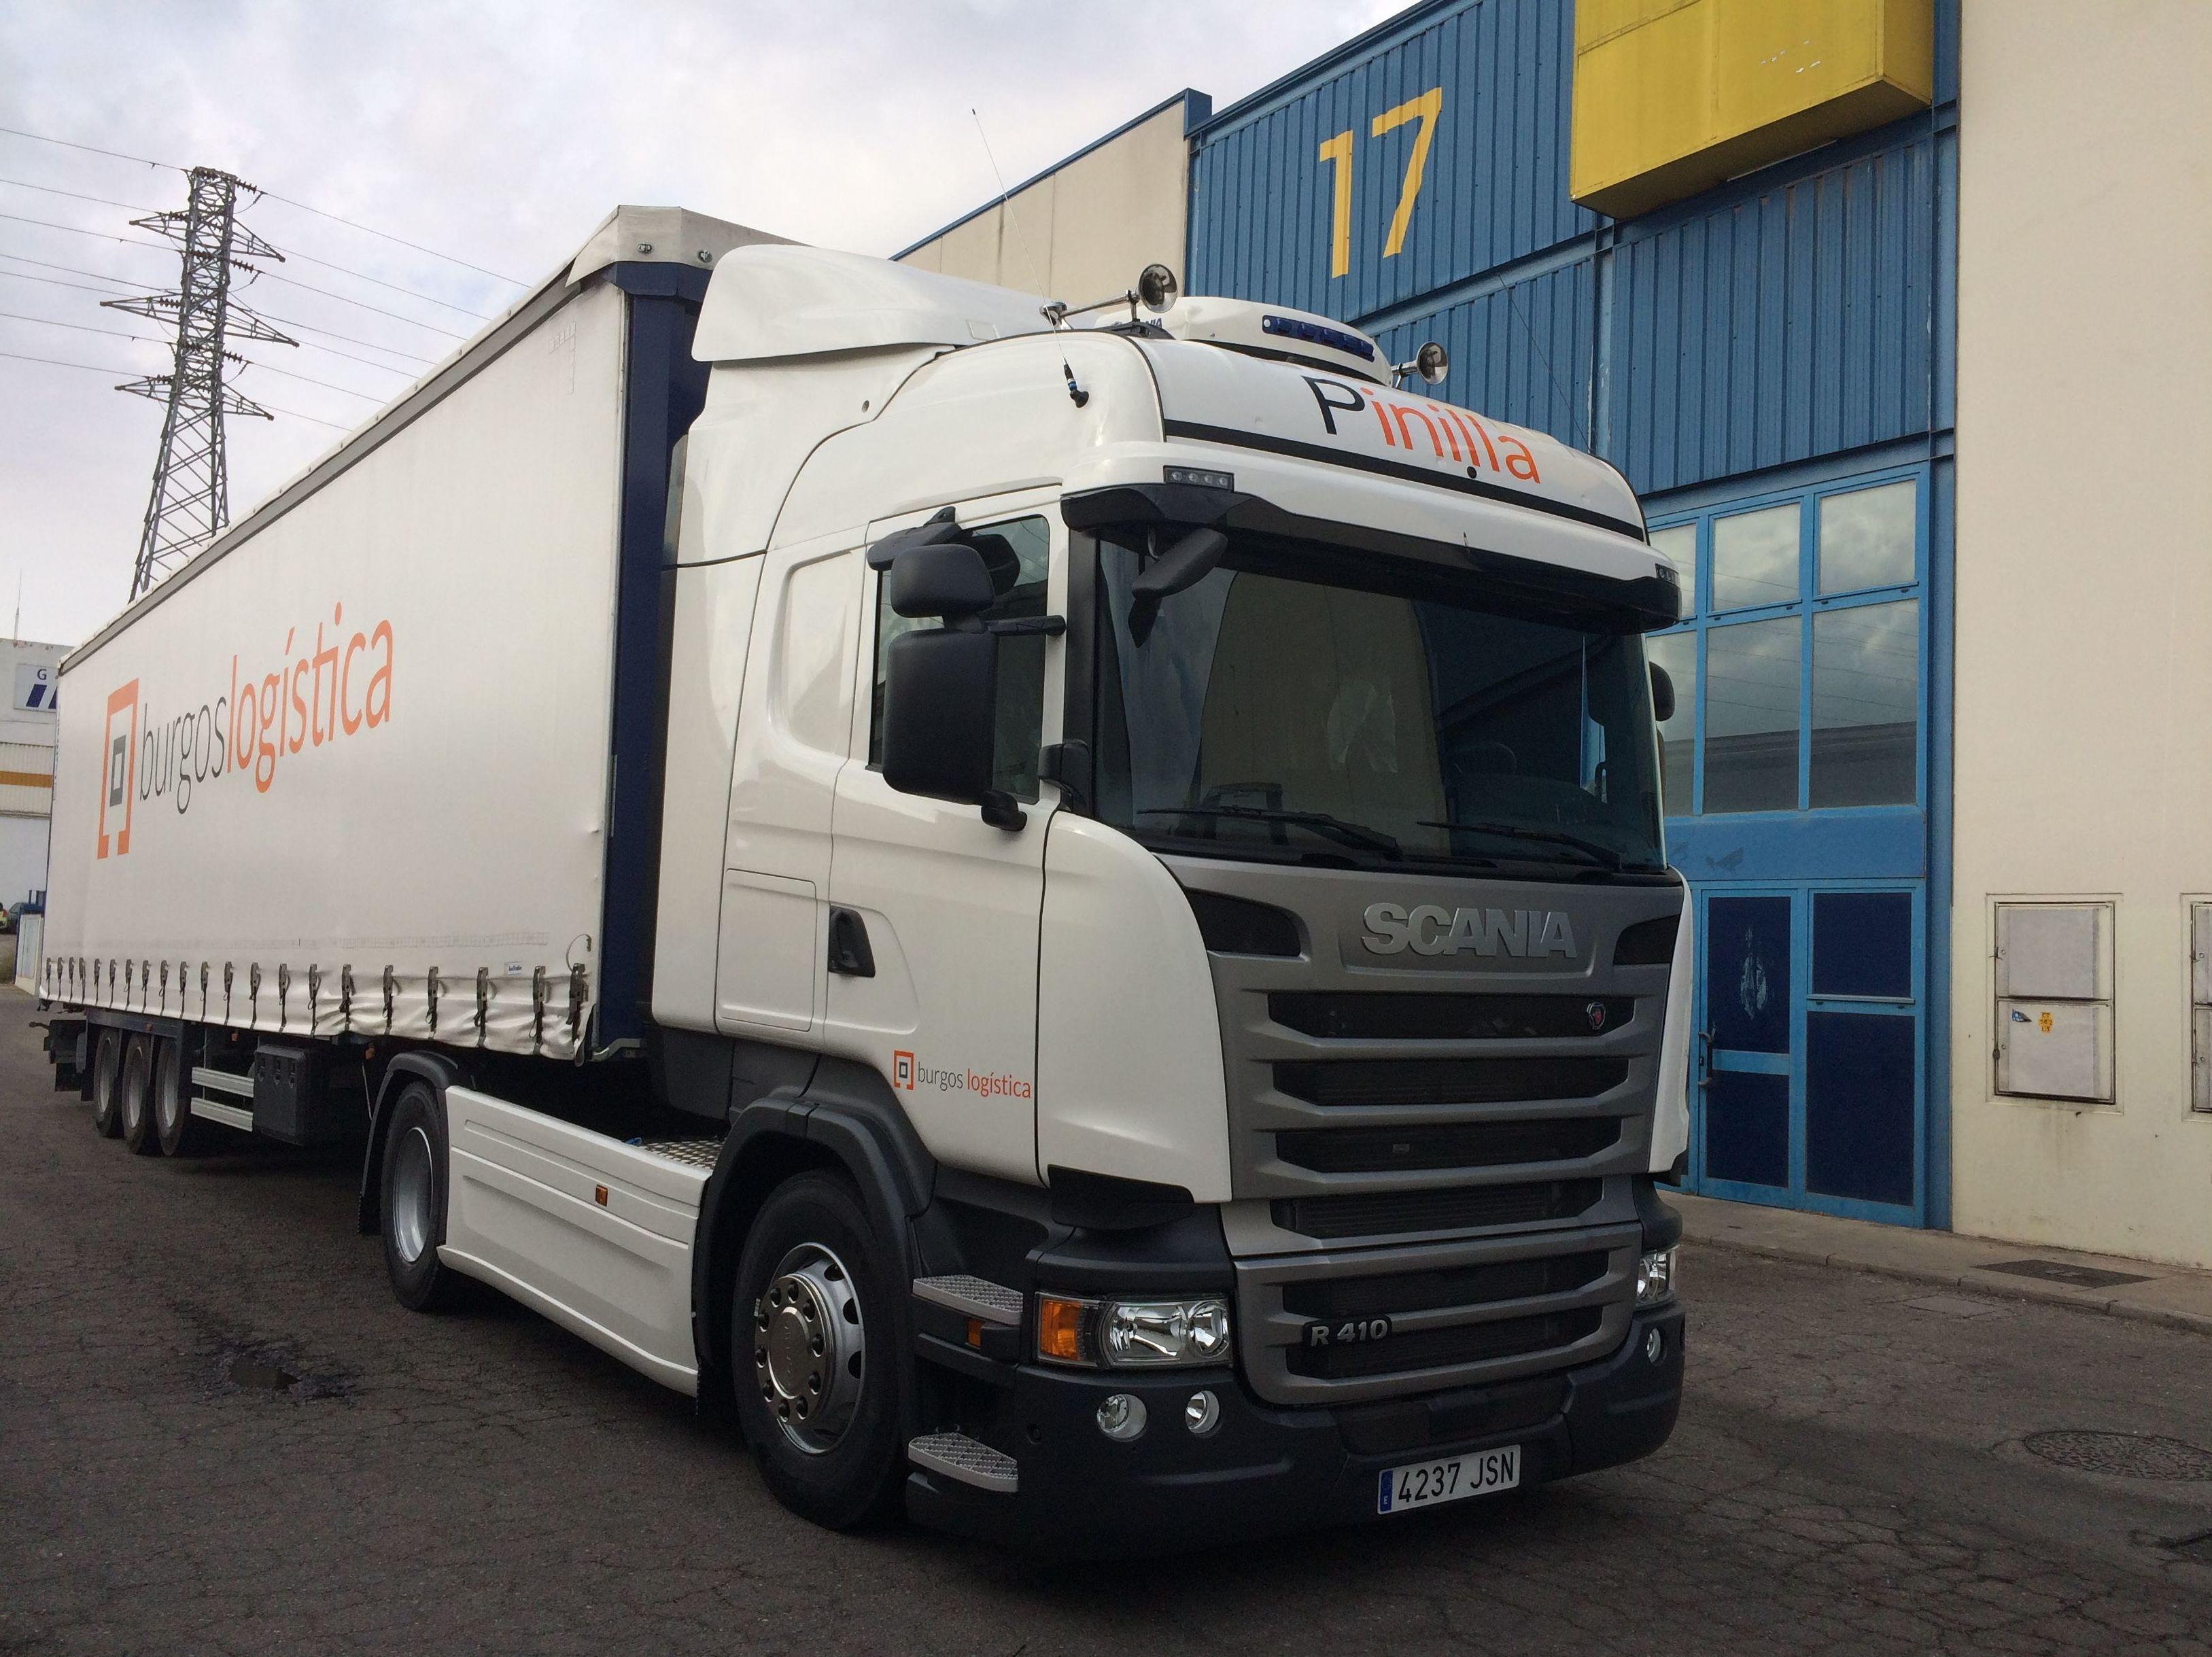 Transportes de mercancías: Servicios de Burgos Logística S.L. - Transportes Pinilla